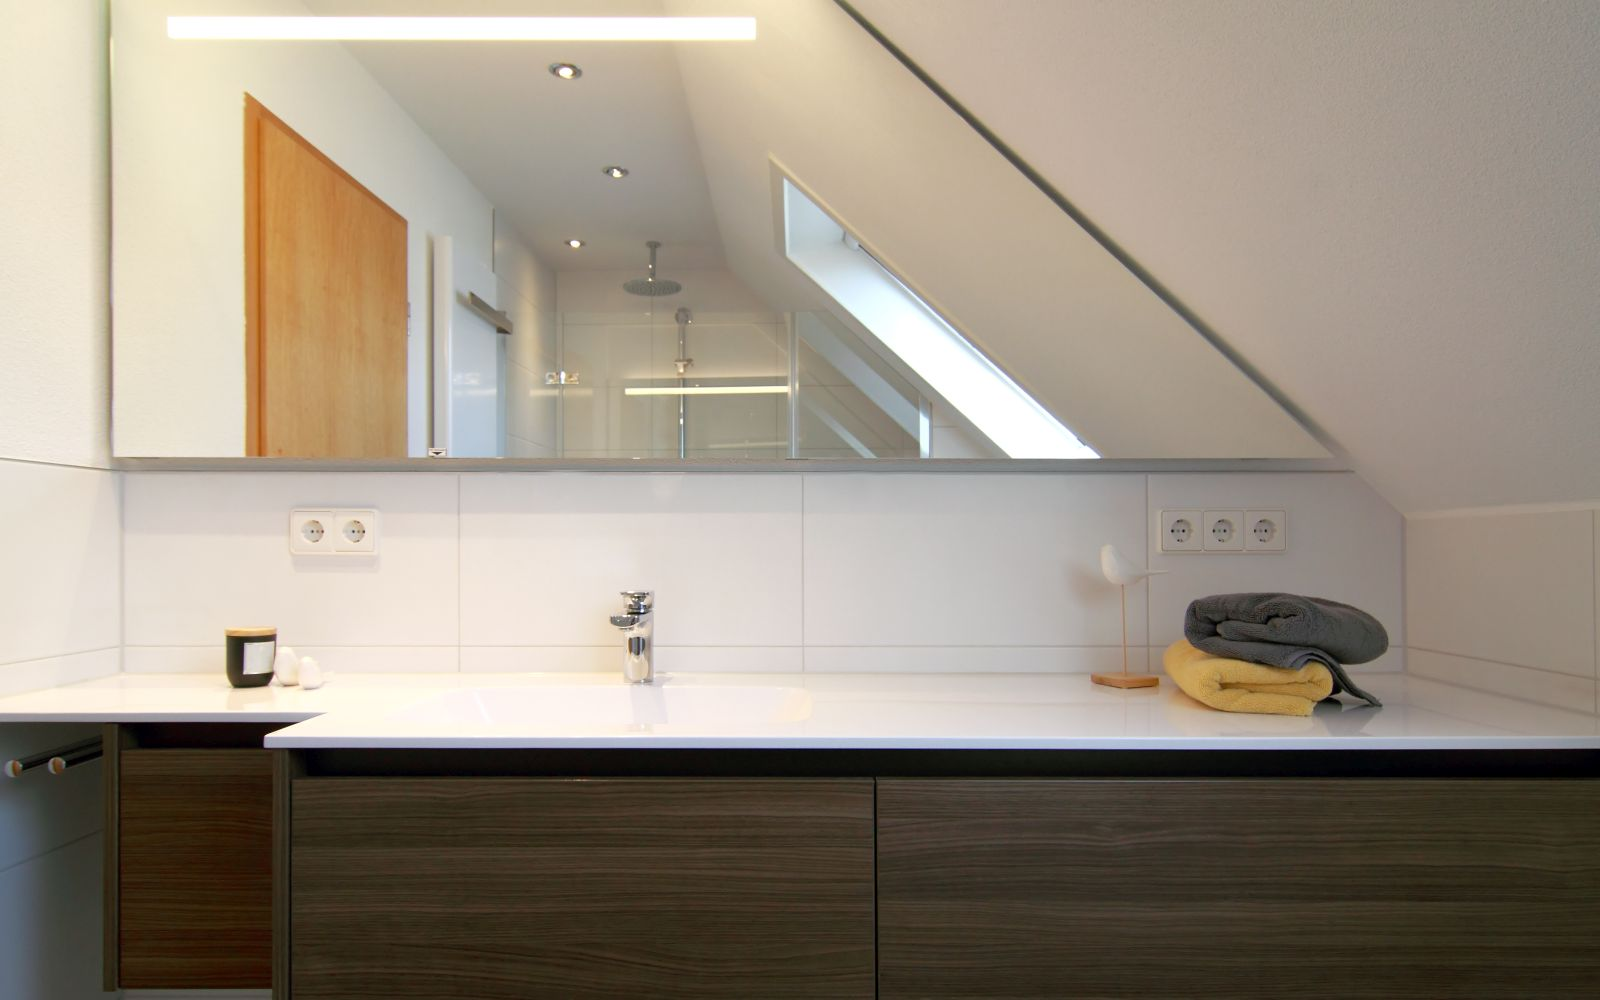 Referenzen Badezimmer Altersgerechtes Bad Im Dachgeschoss Stubler